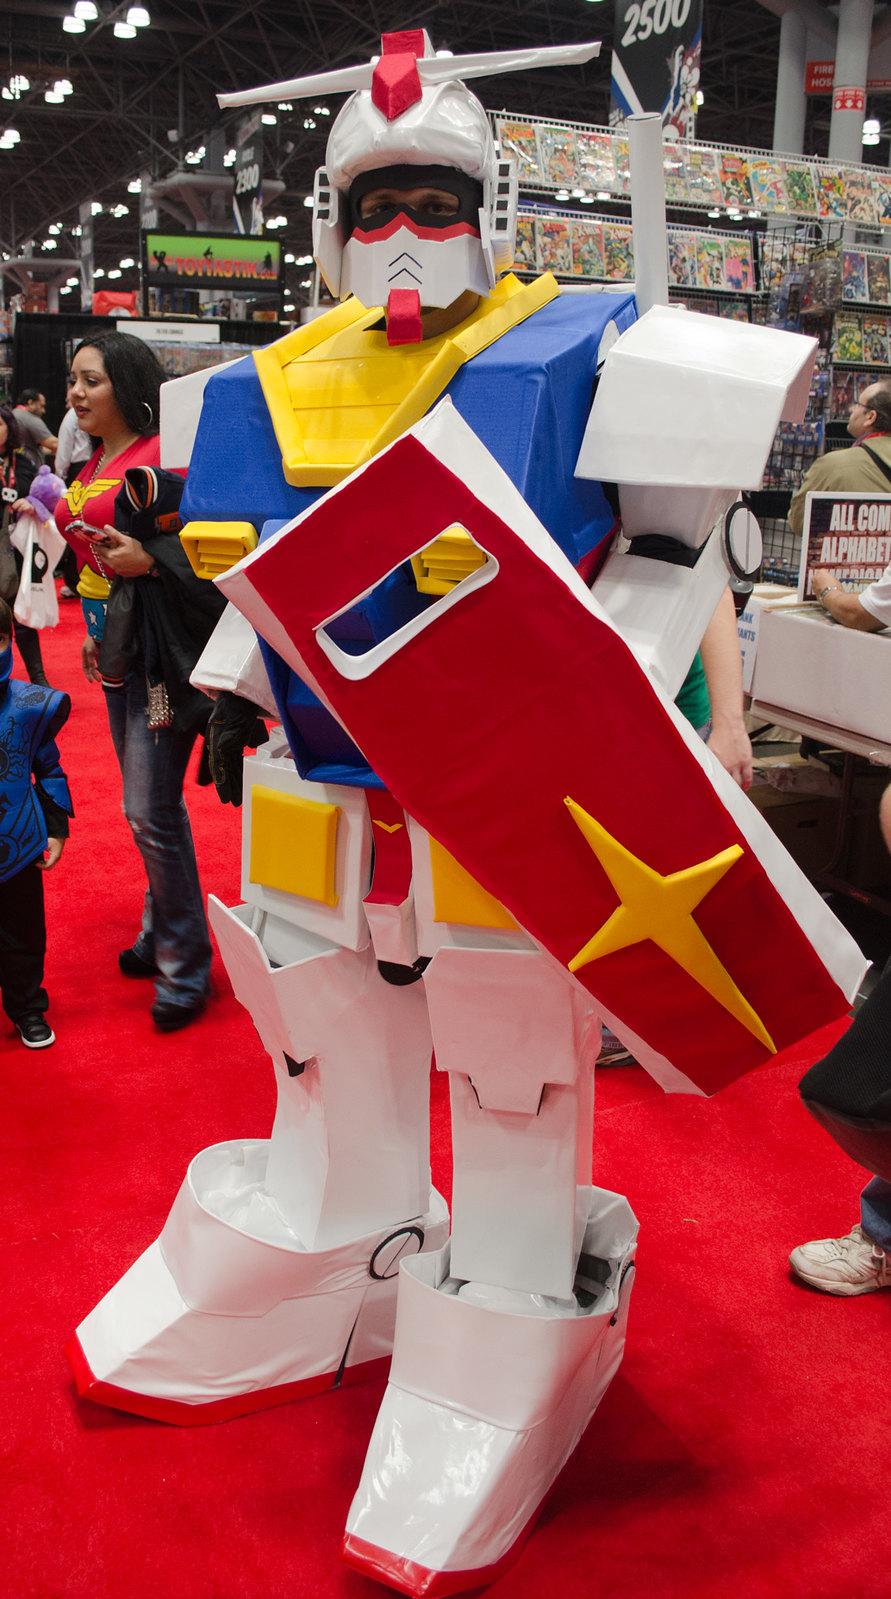 NYCC 2013 Gundam Cosplay